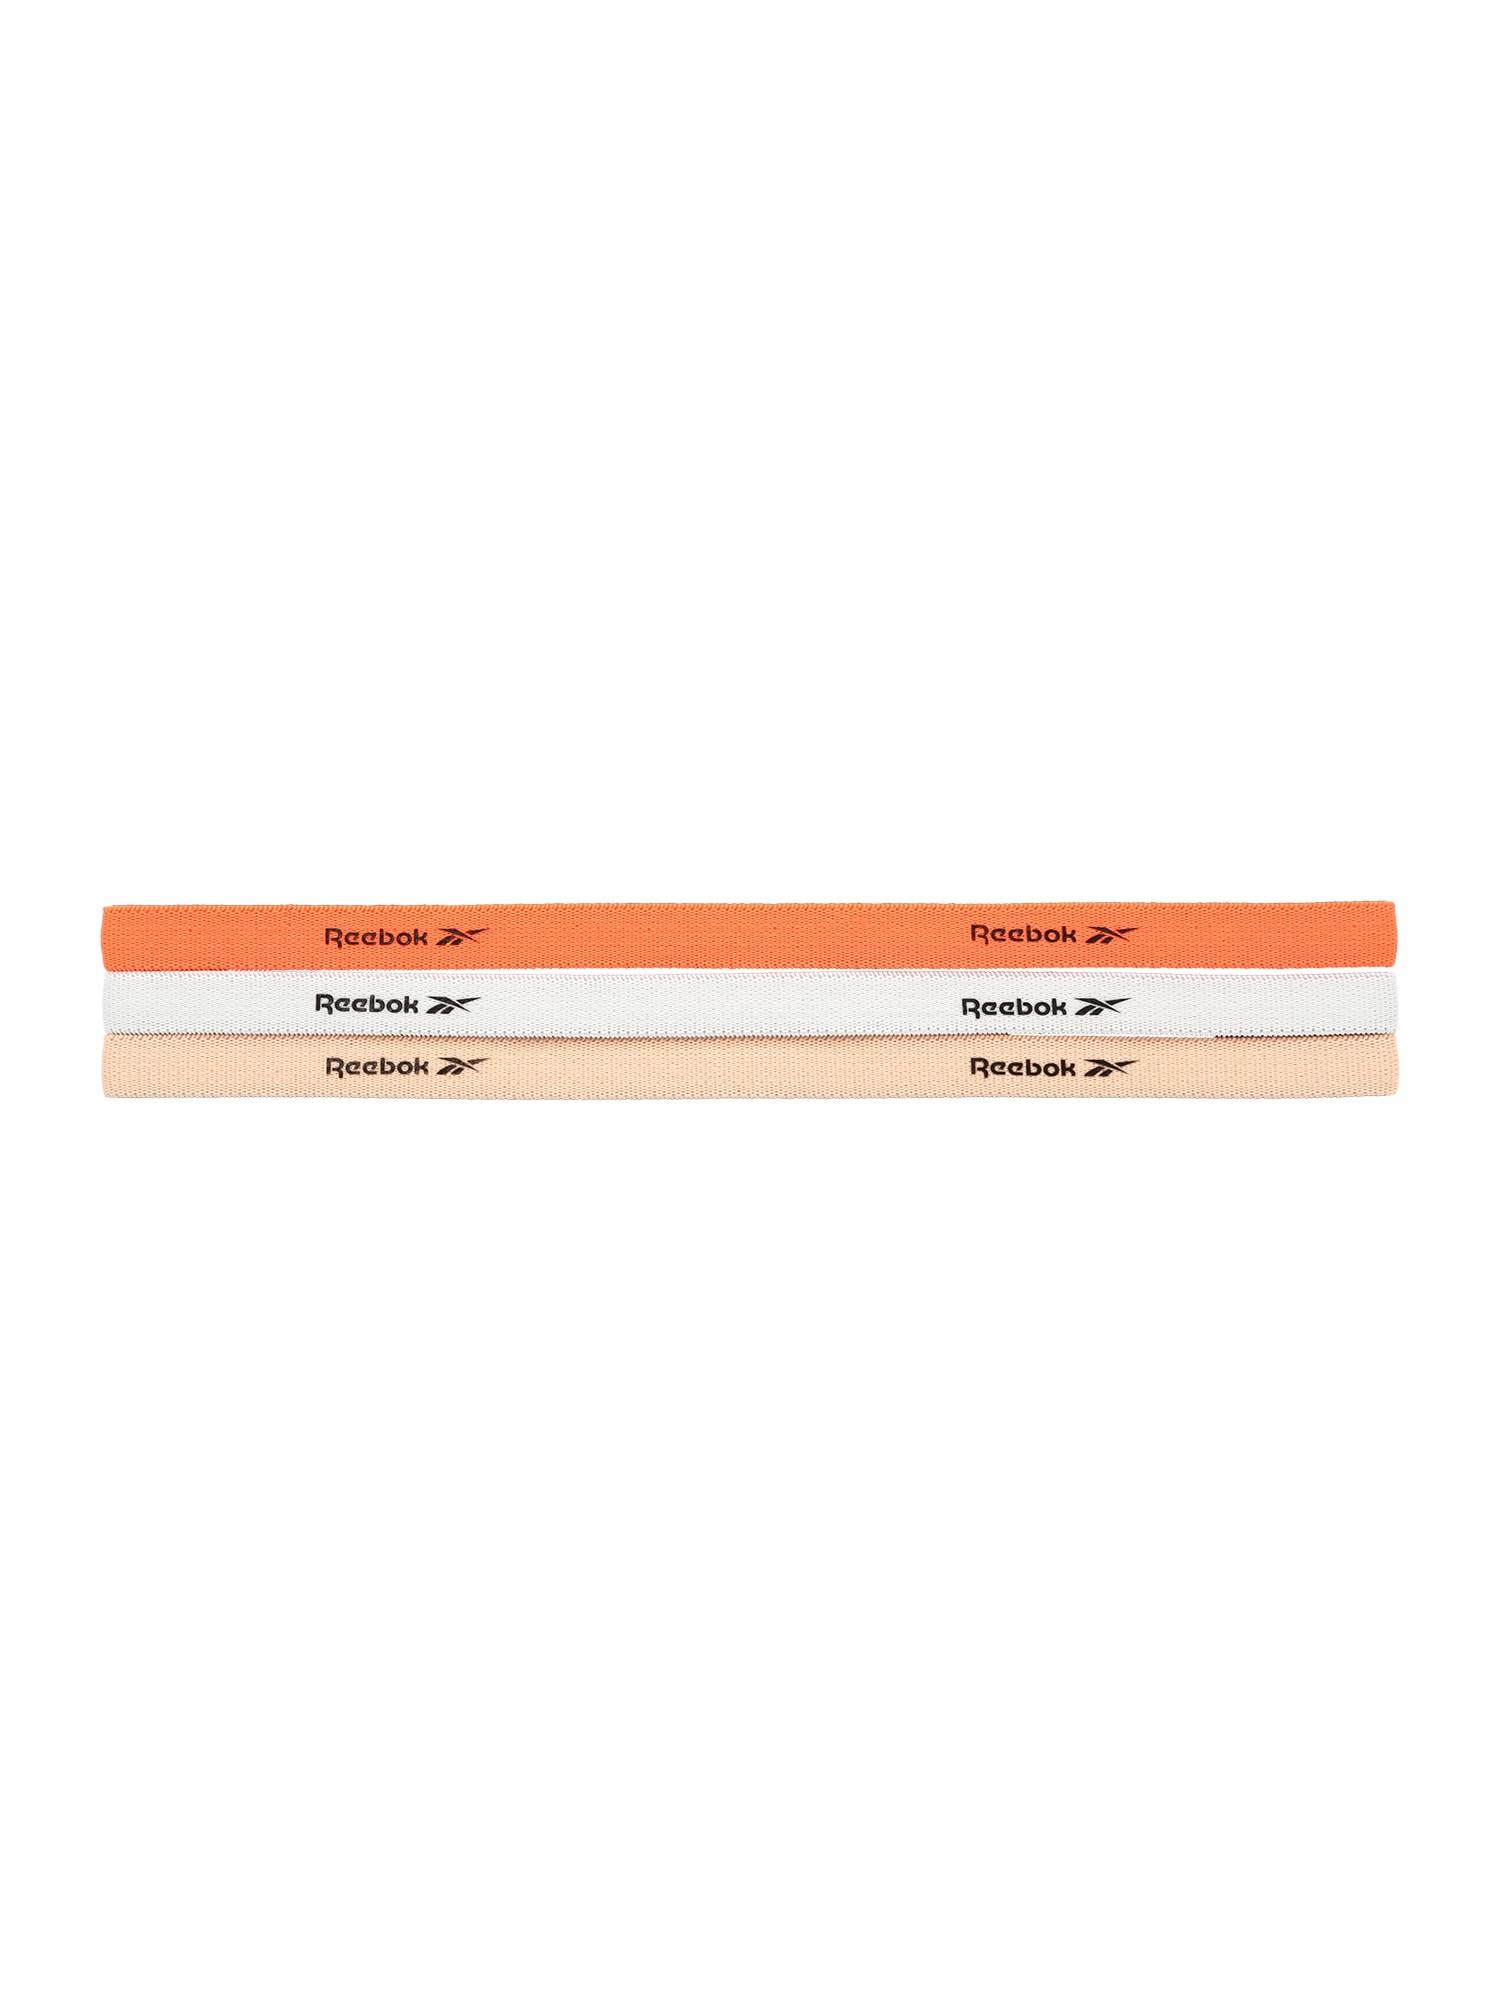 REEBOK Bandeau de transpiration  - Orange, Blanc - Taille: OSFM - male